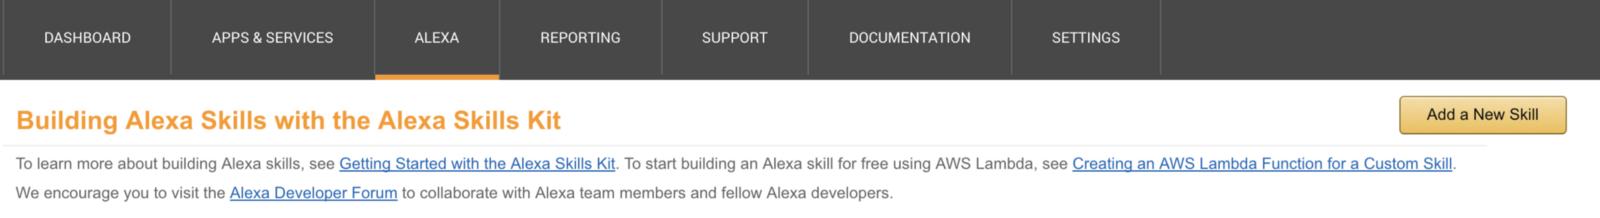 Make any TV voice controlled through Amazon Alexa and